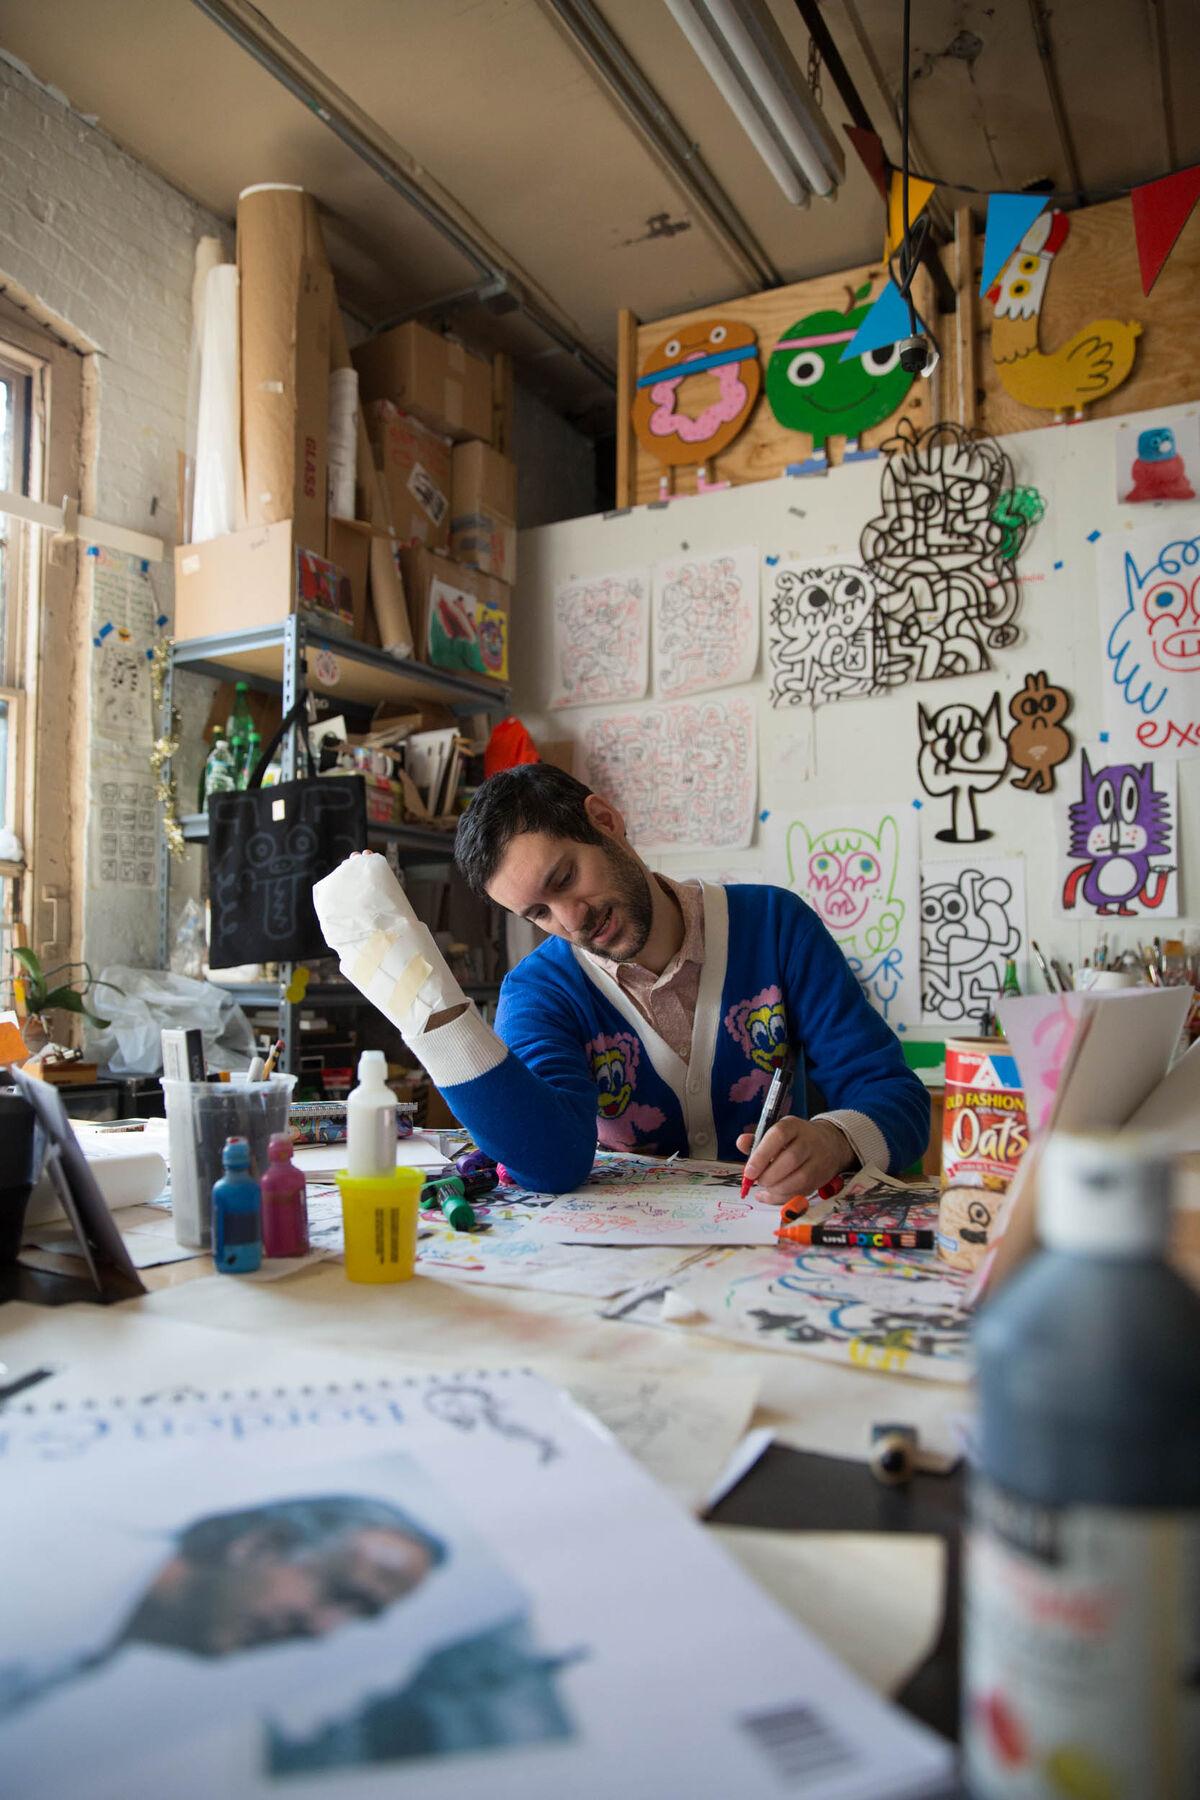 Portrait of Jon Burgerman. Photo by Bas Berkhout. Courtesy of the artist.